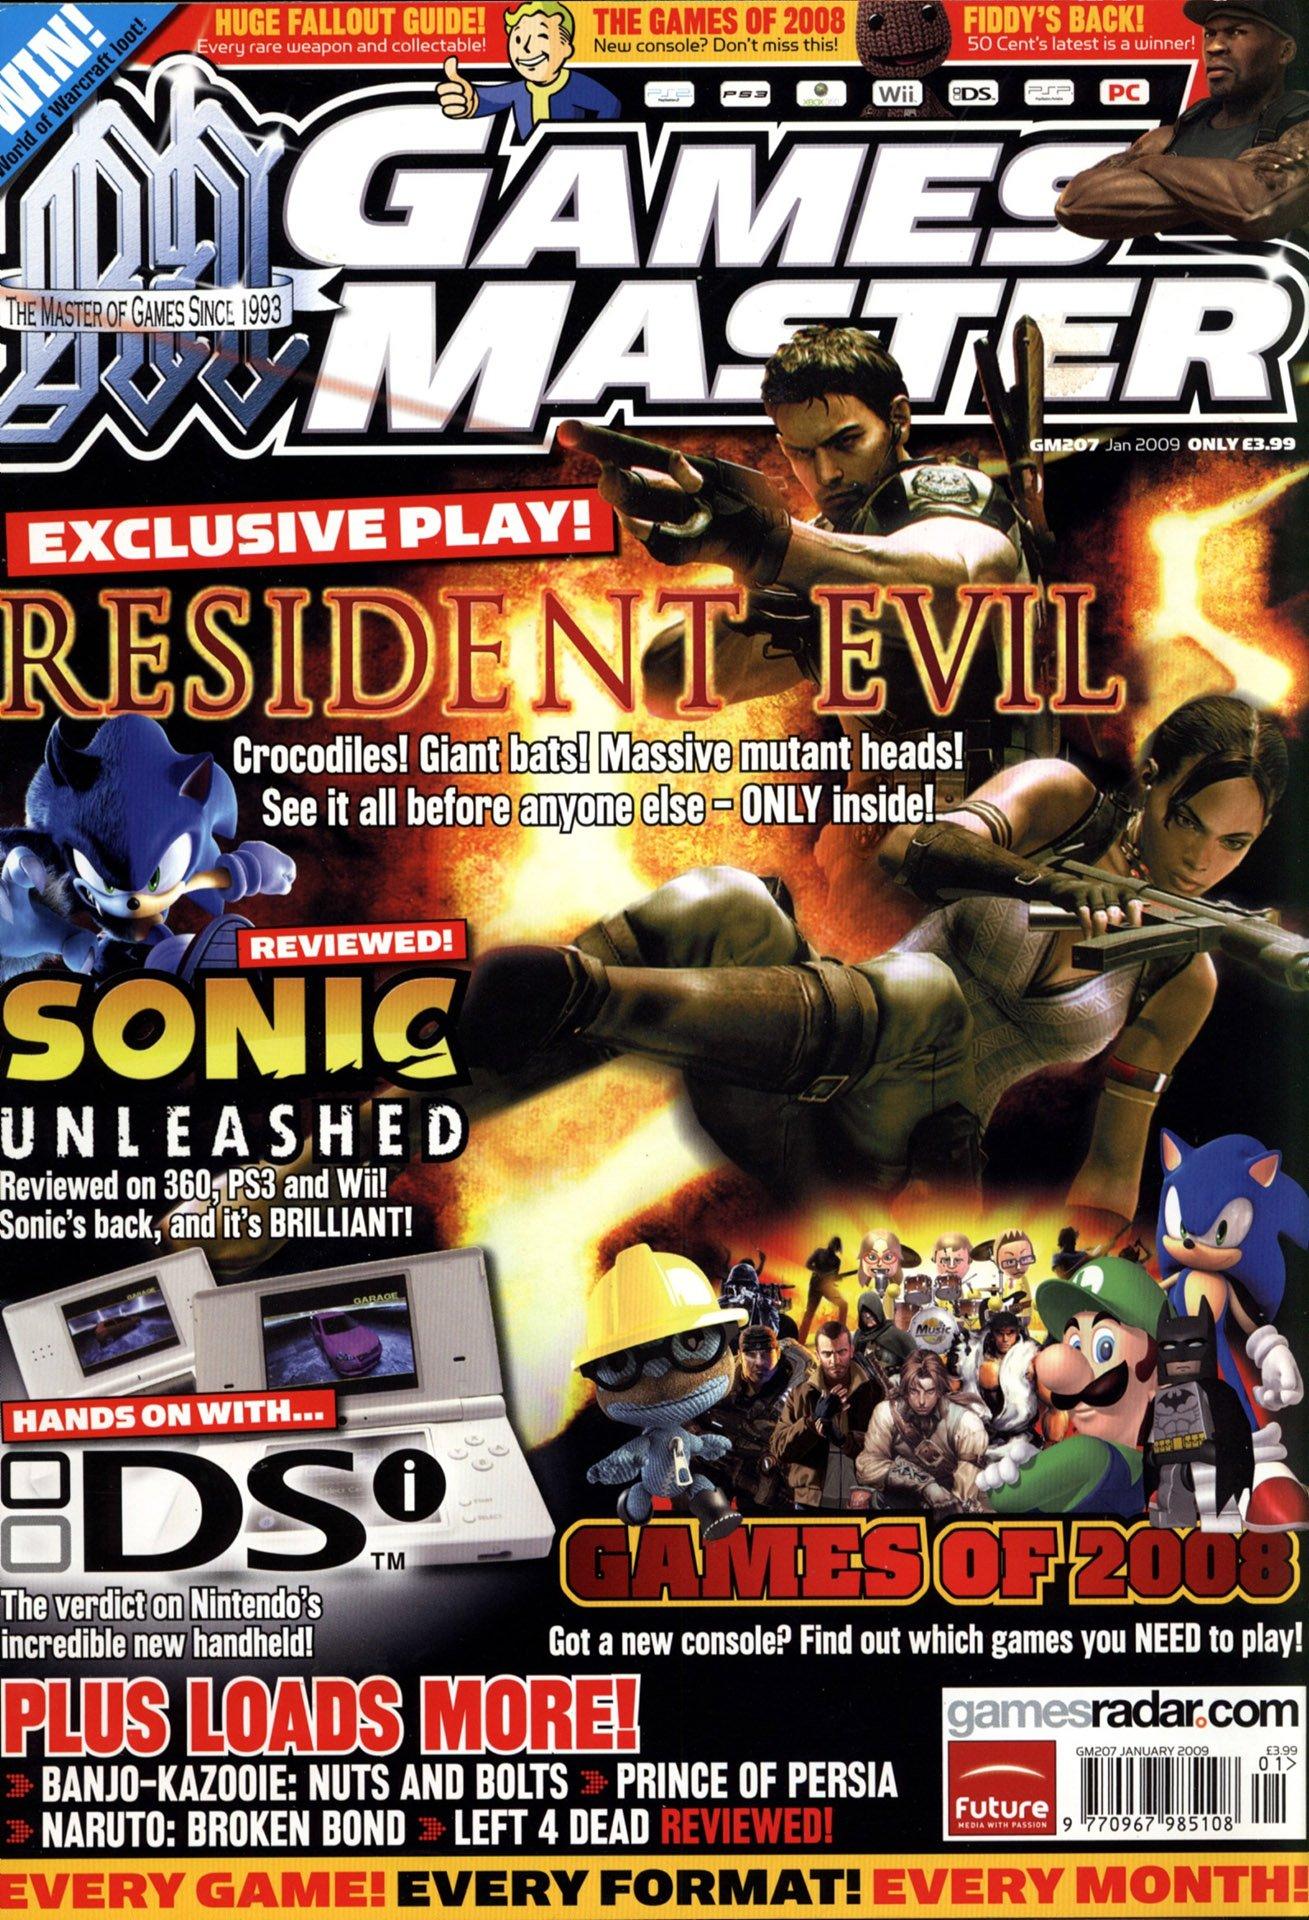 GamesMaster Issue 207 (January 2009)